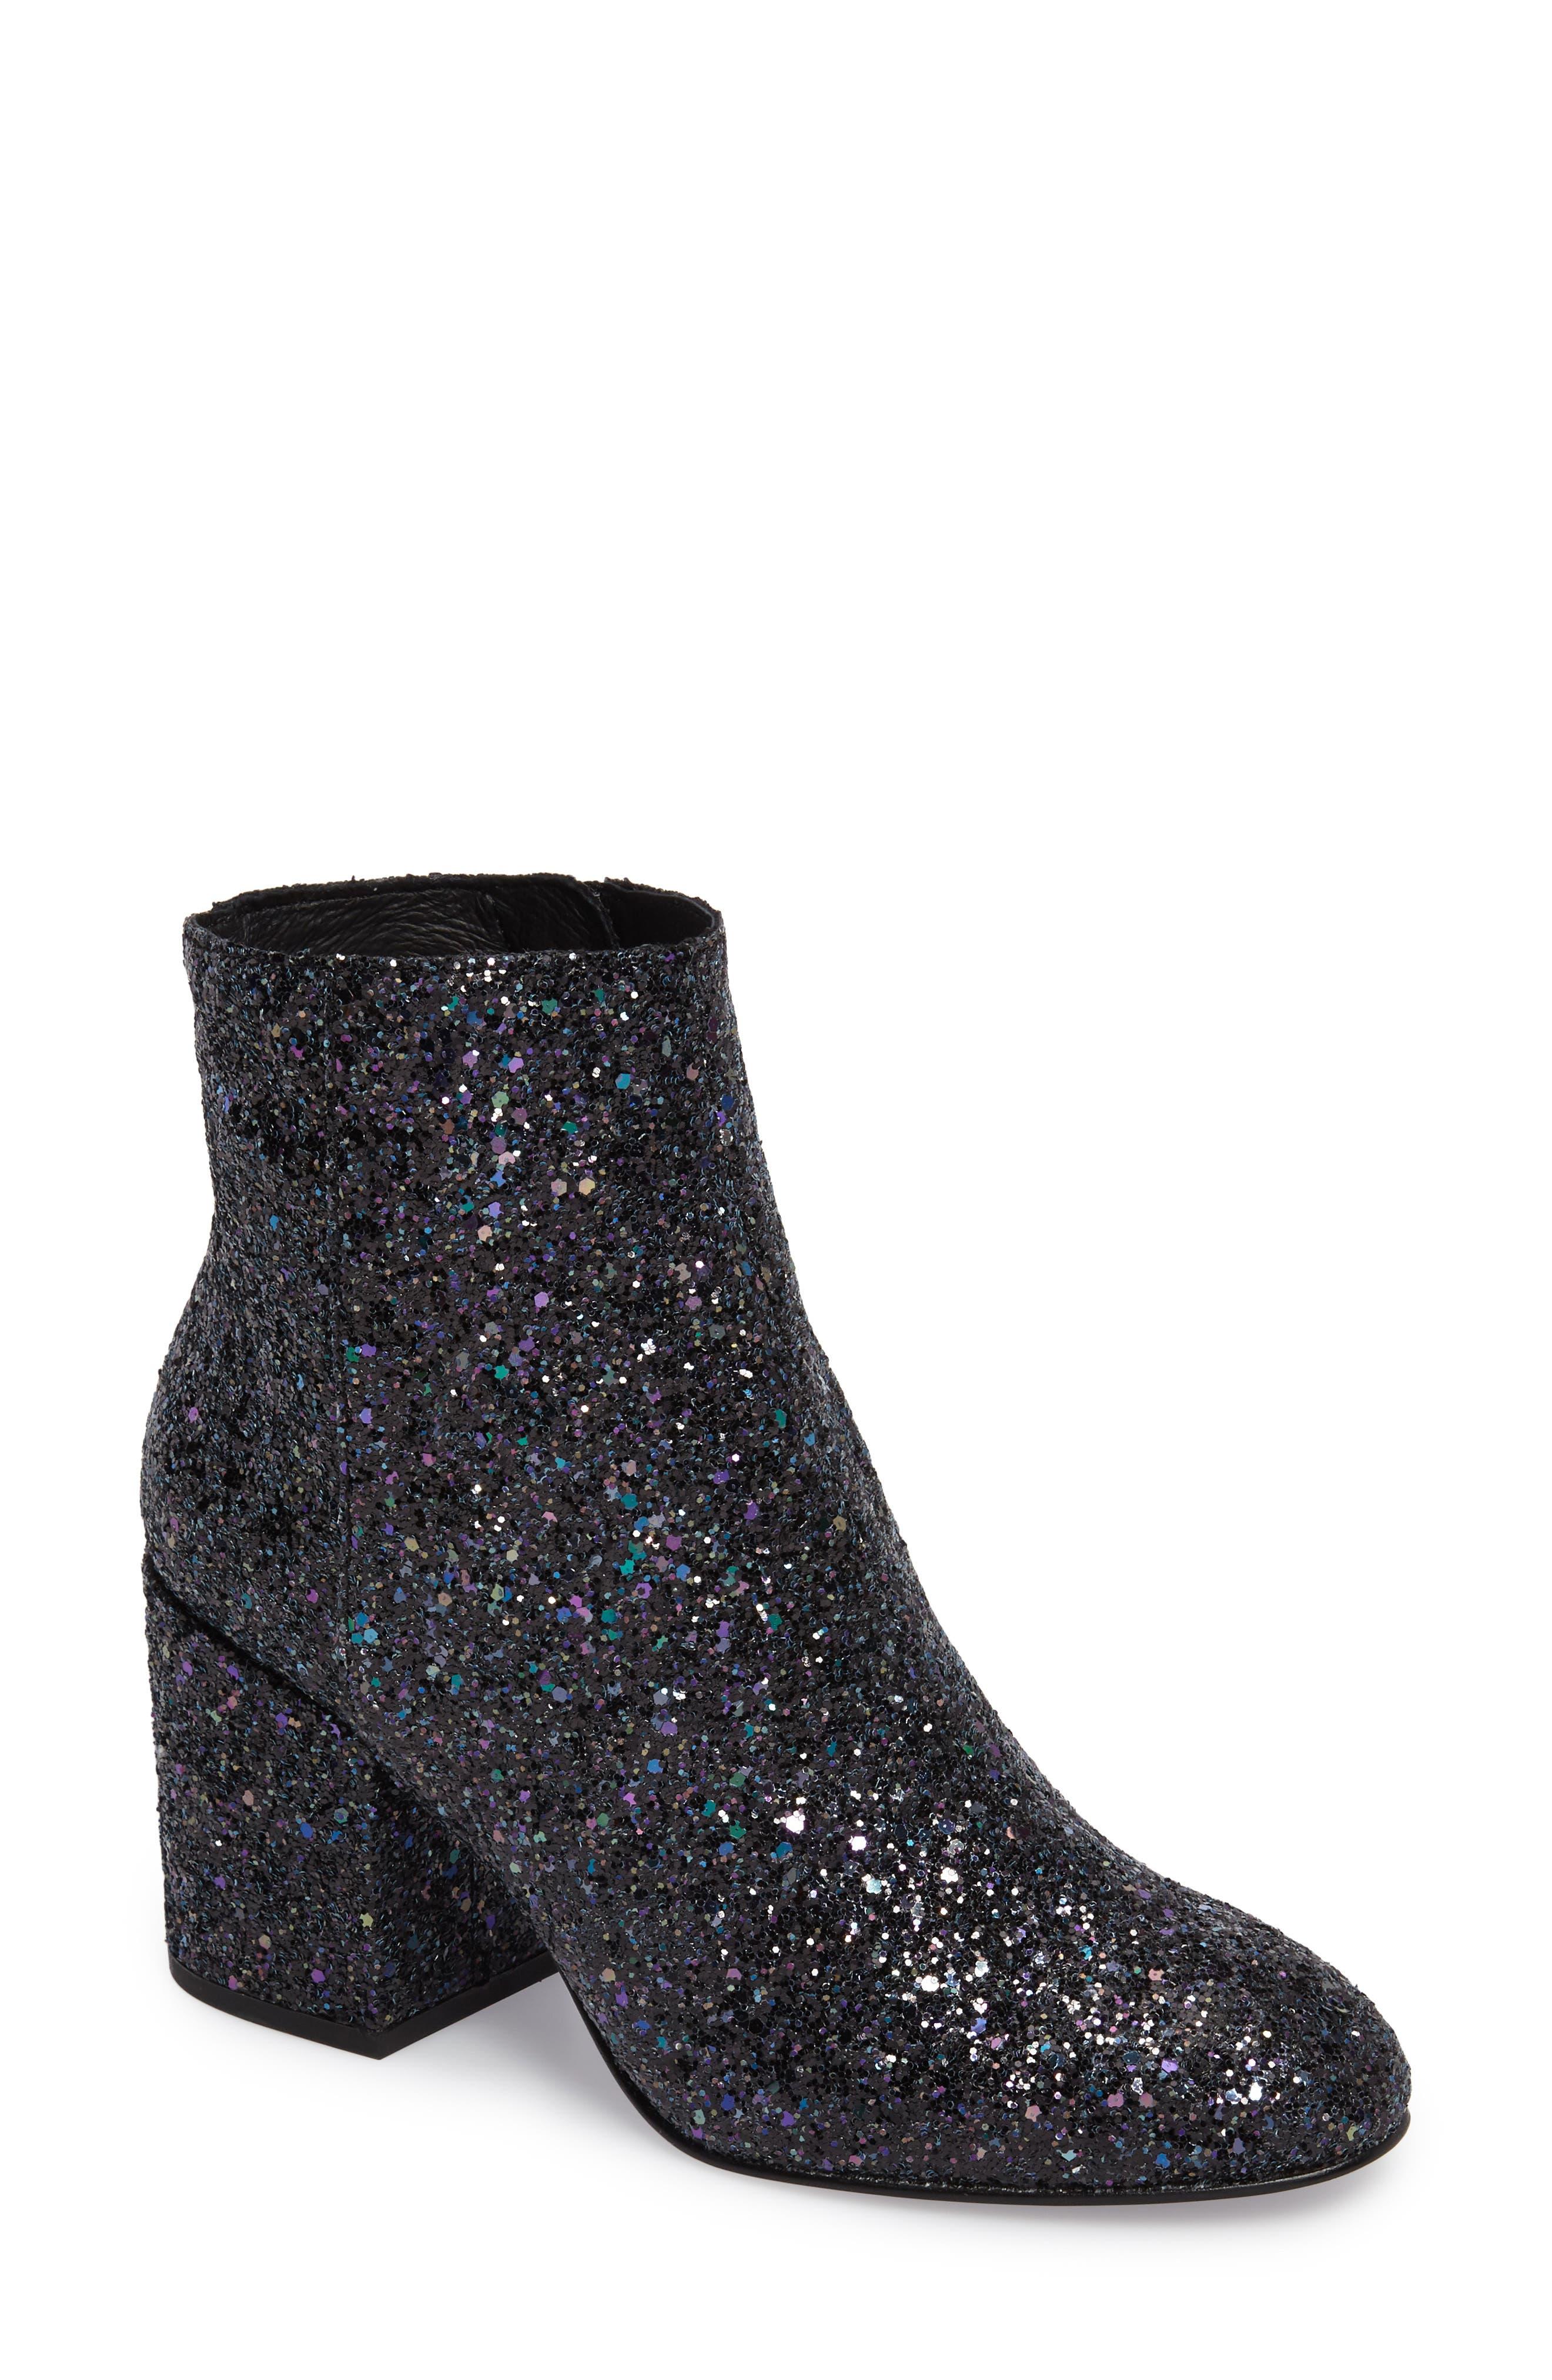 Egoiste Glitter Bootie,                         Main,                         color, Midnight Glitter Fabric